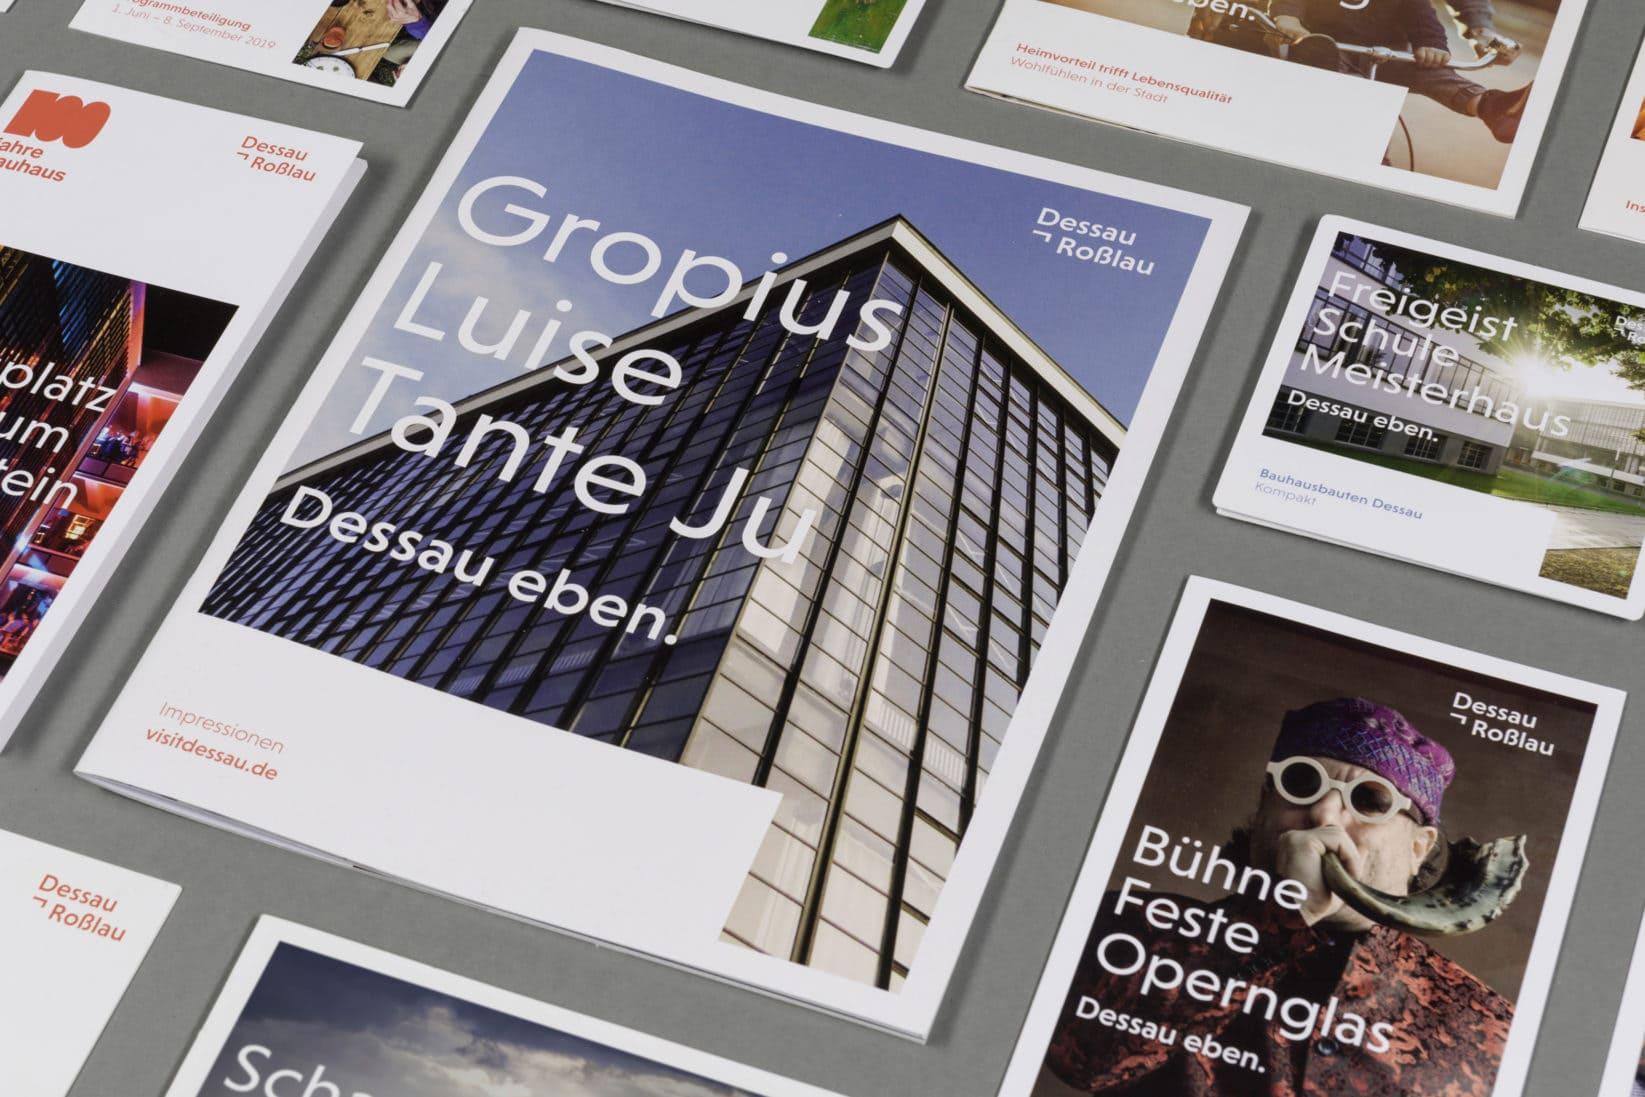 Dessau-Rosslau Corporate Design Cover